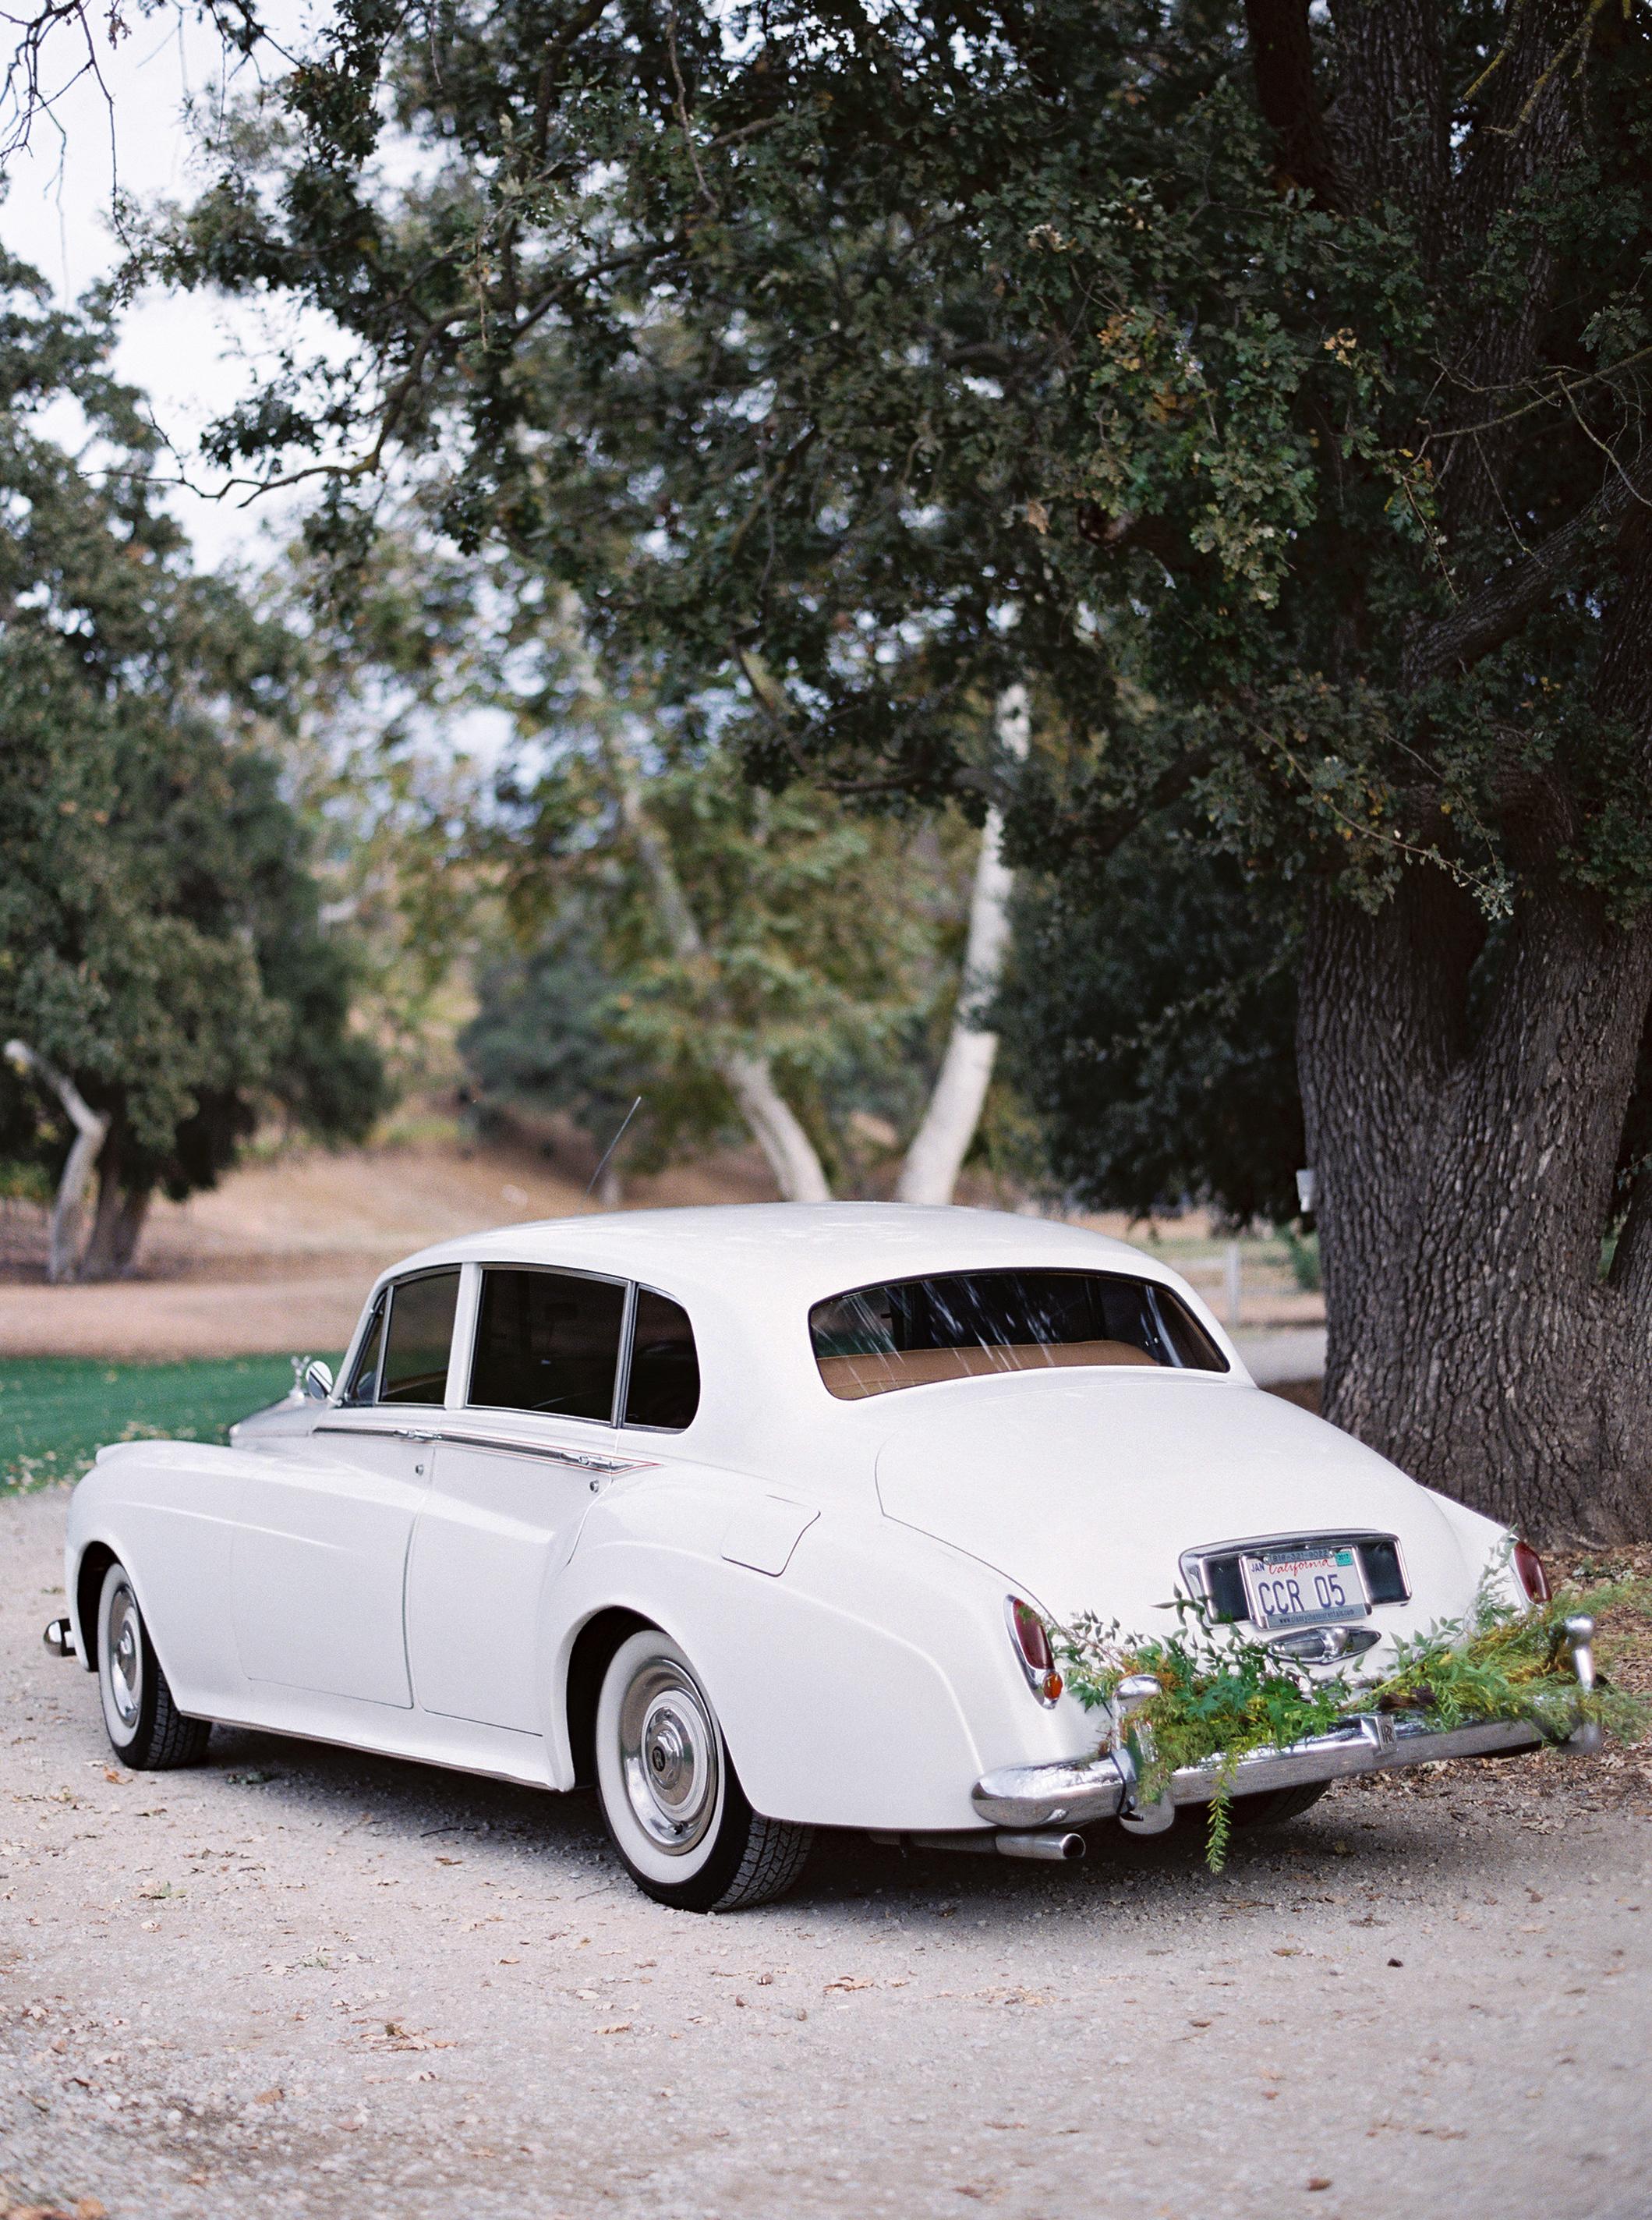 11-Photo by Christine Donee_Vintage Car Floral Decor by Ellamah_Triunfo Creek.jpg